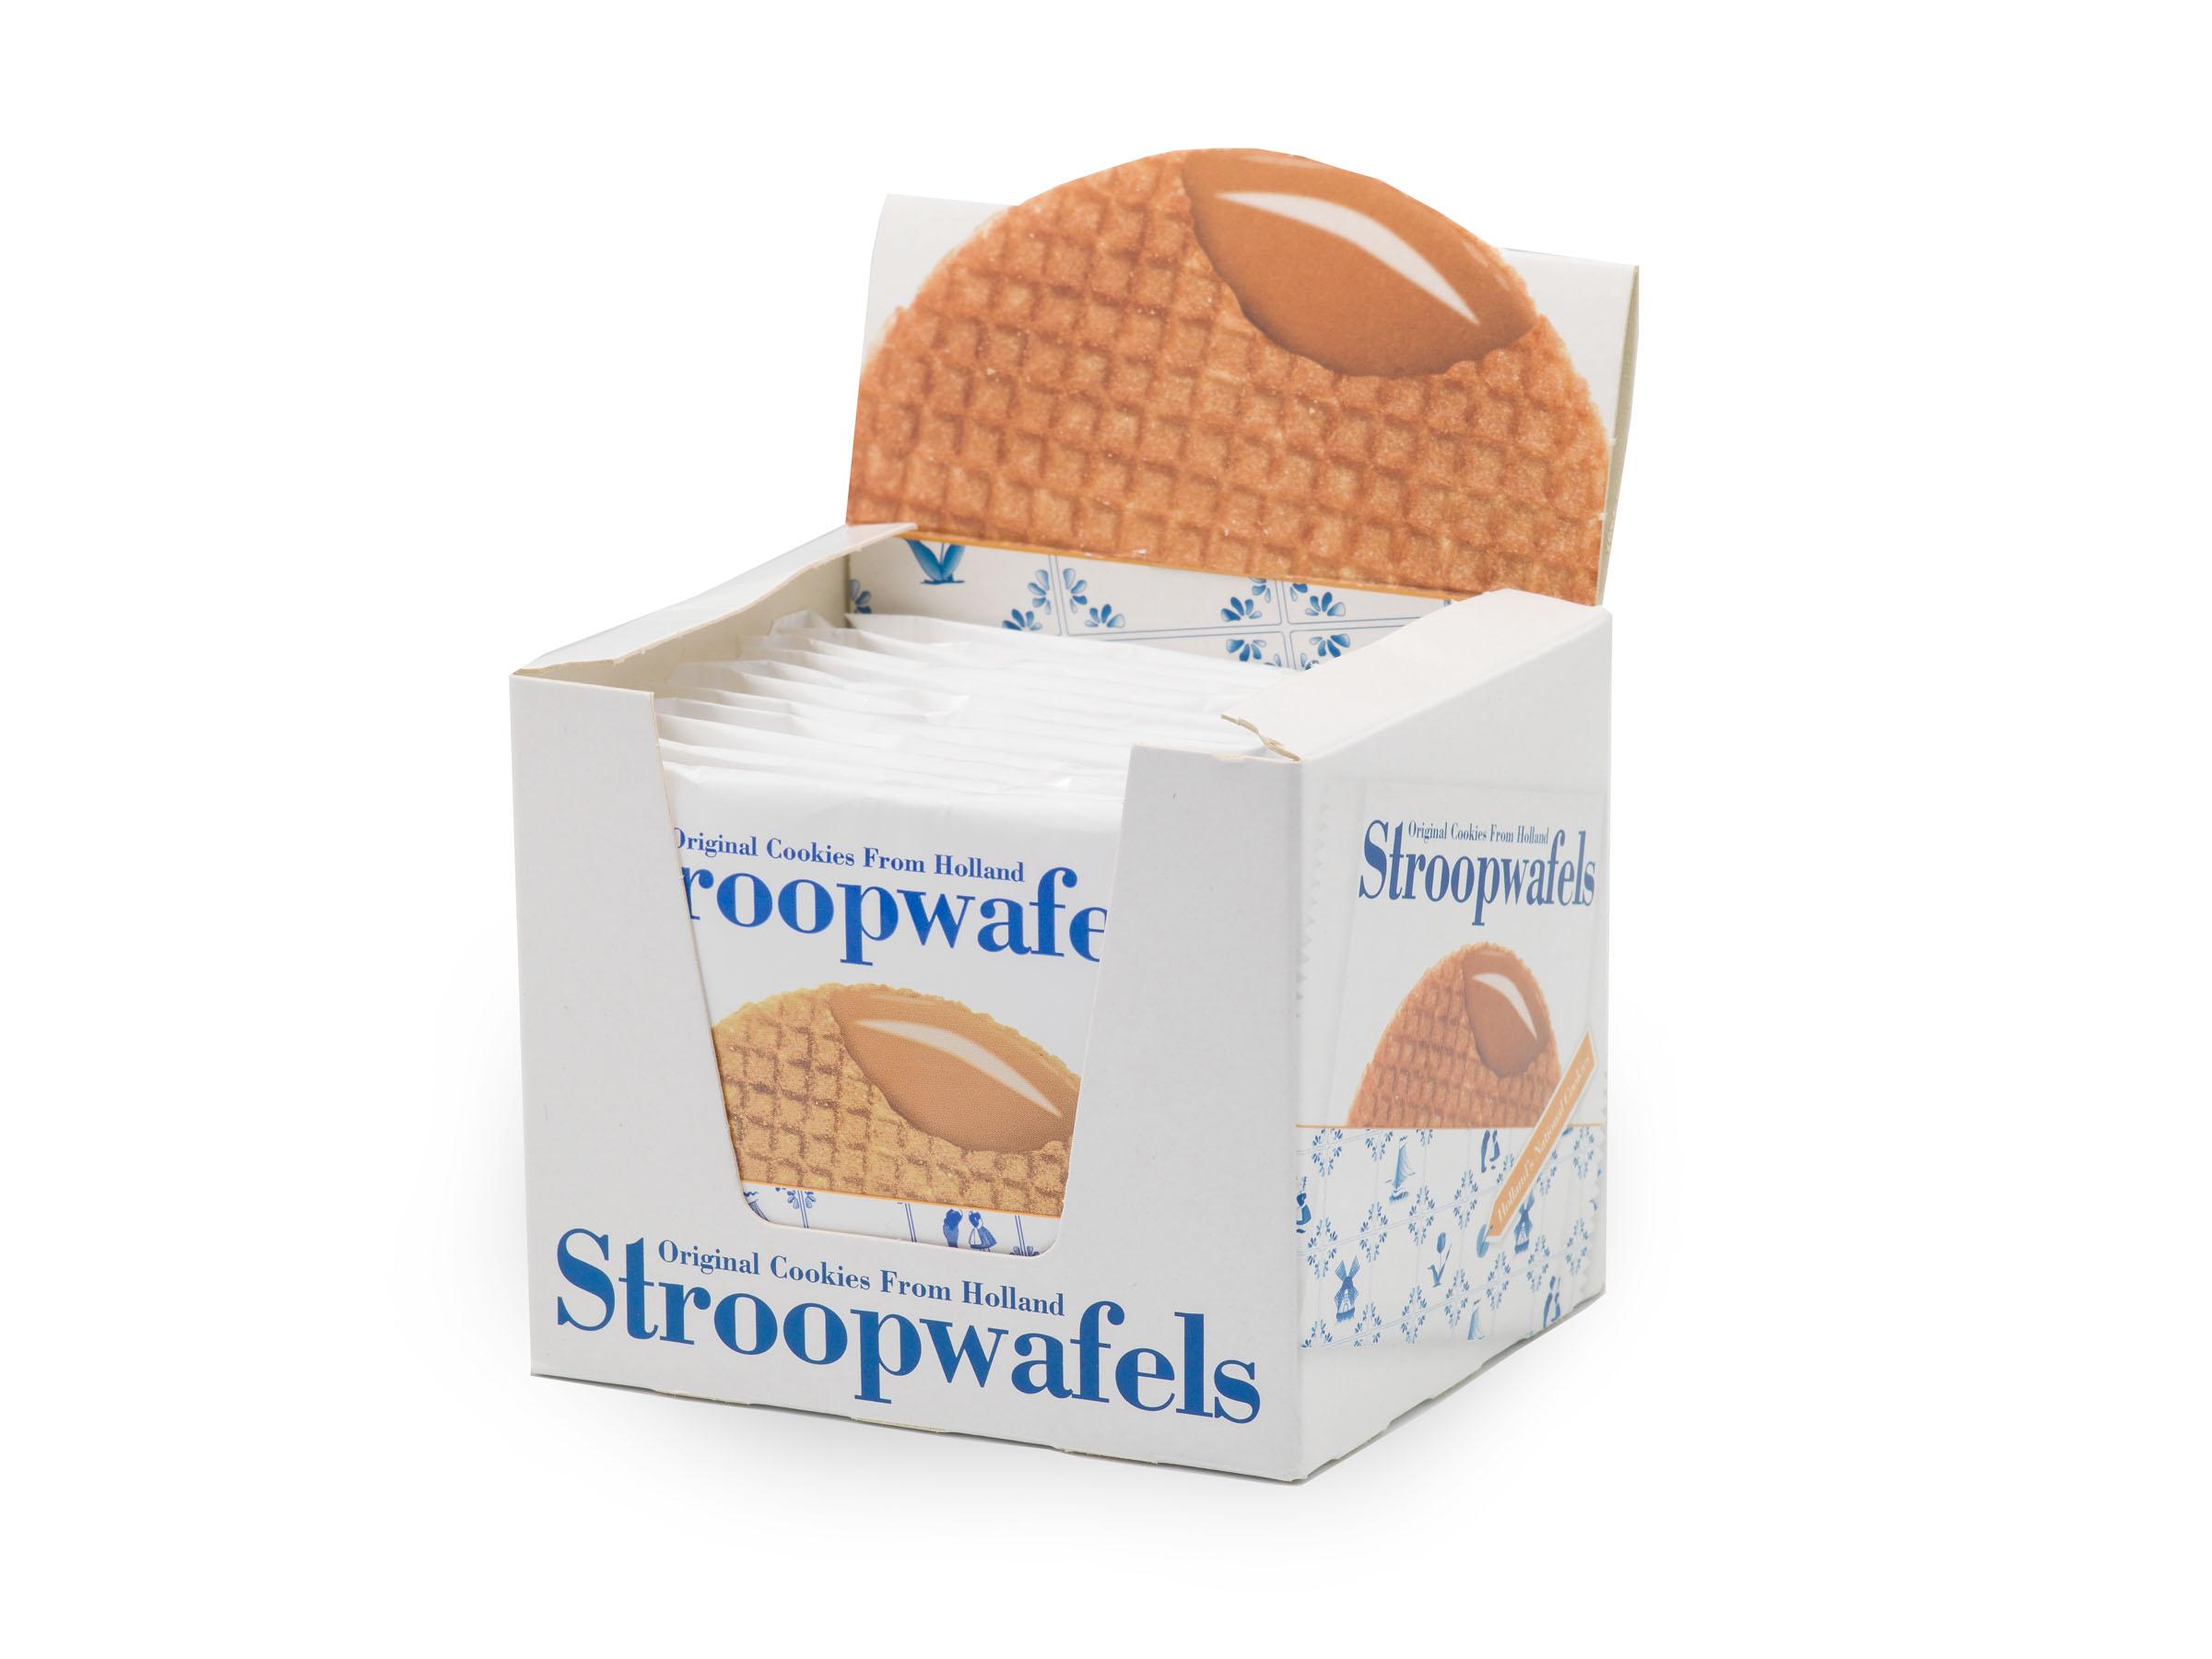 Stroopwafel And Co -13201 - Single Packed.jpg